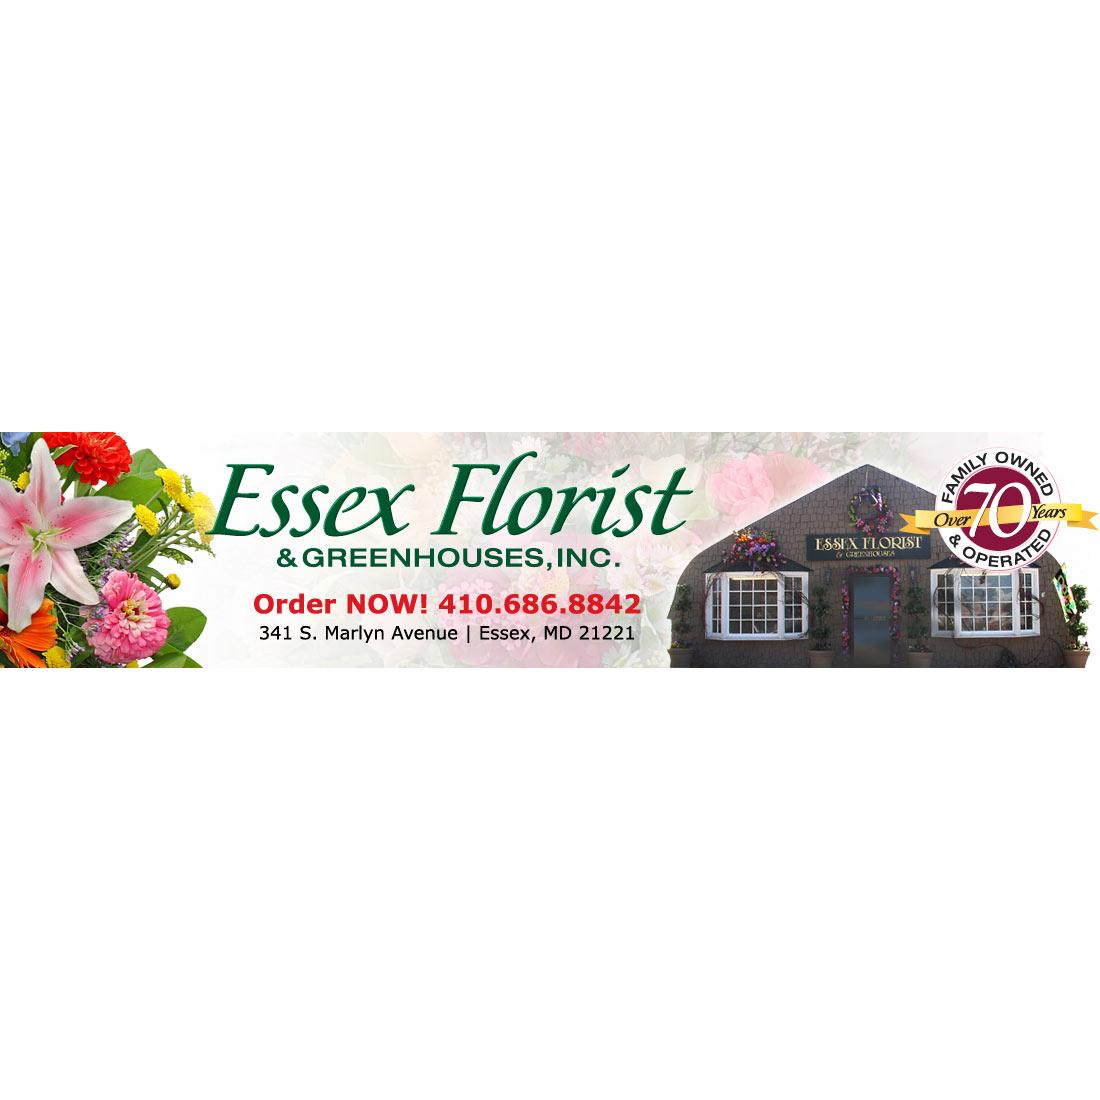 Essex Florist & Greenhouses, Inc